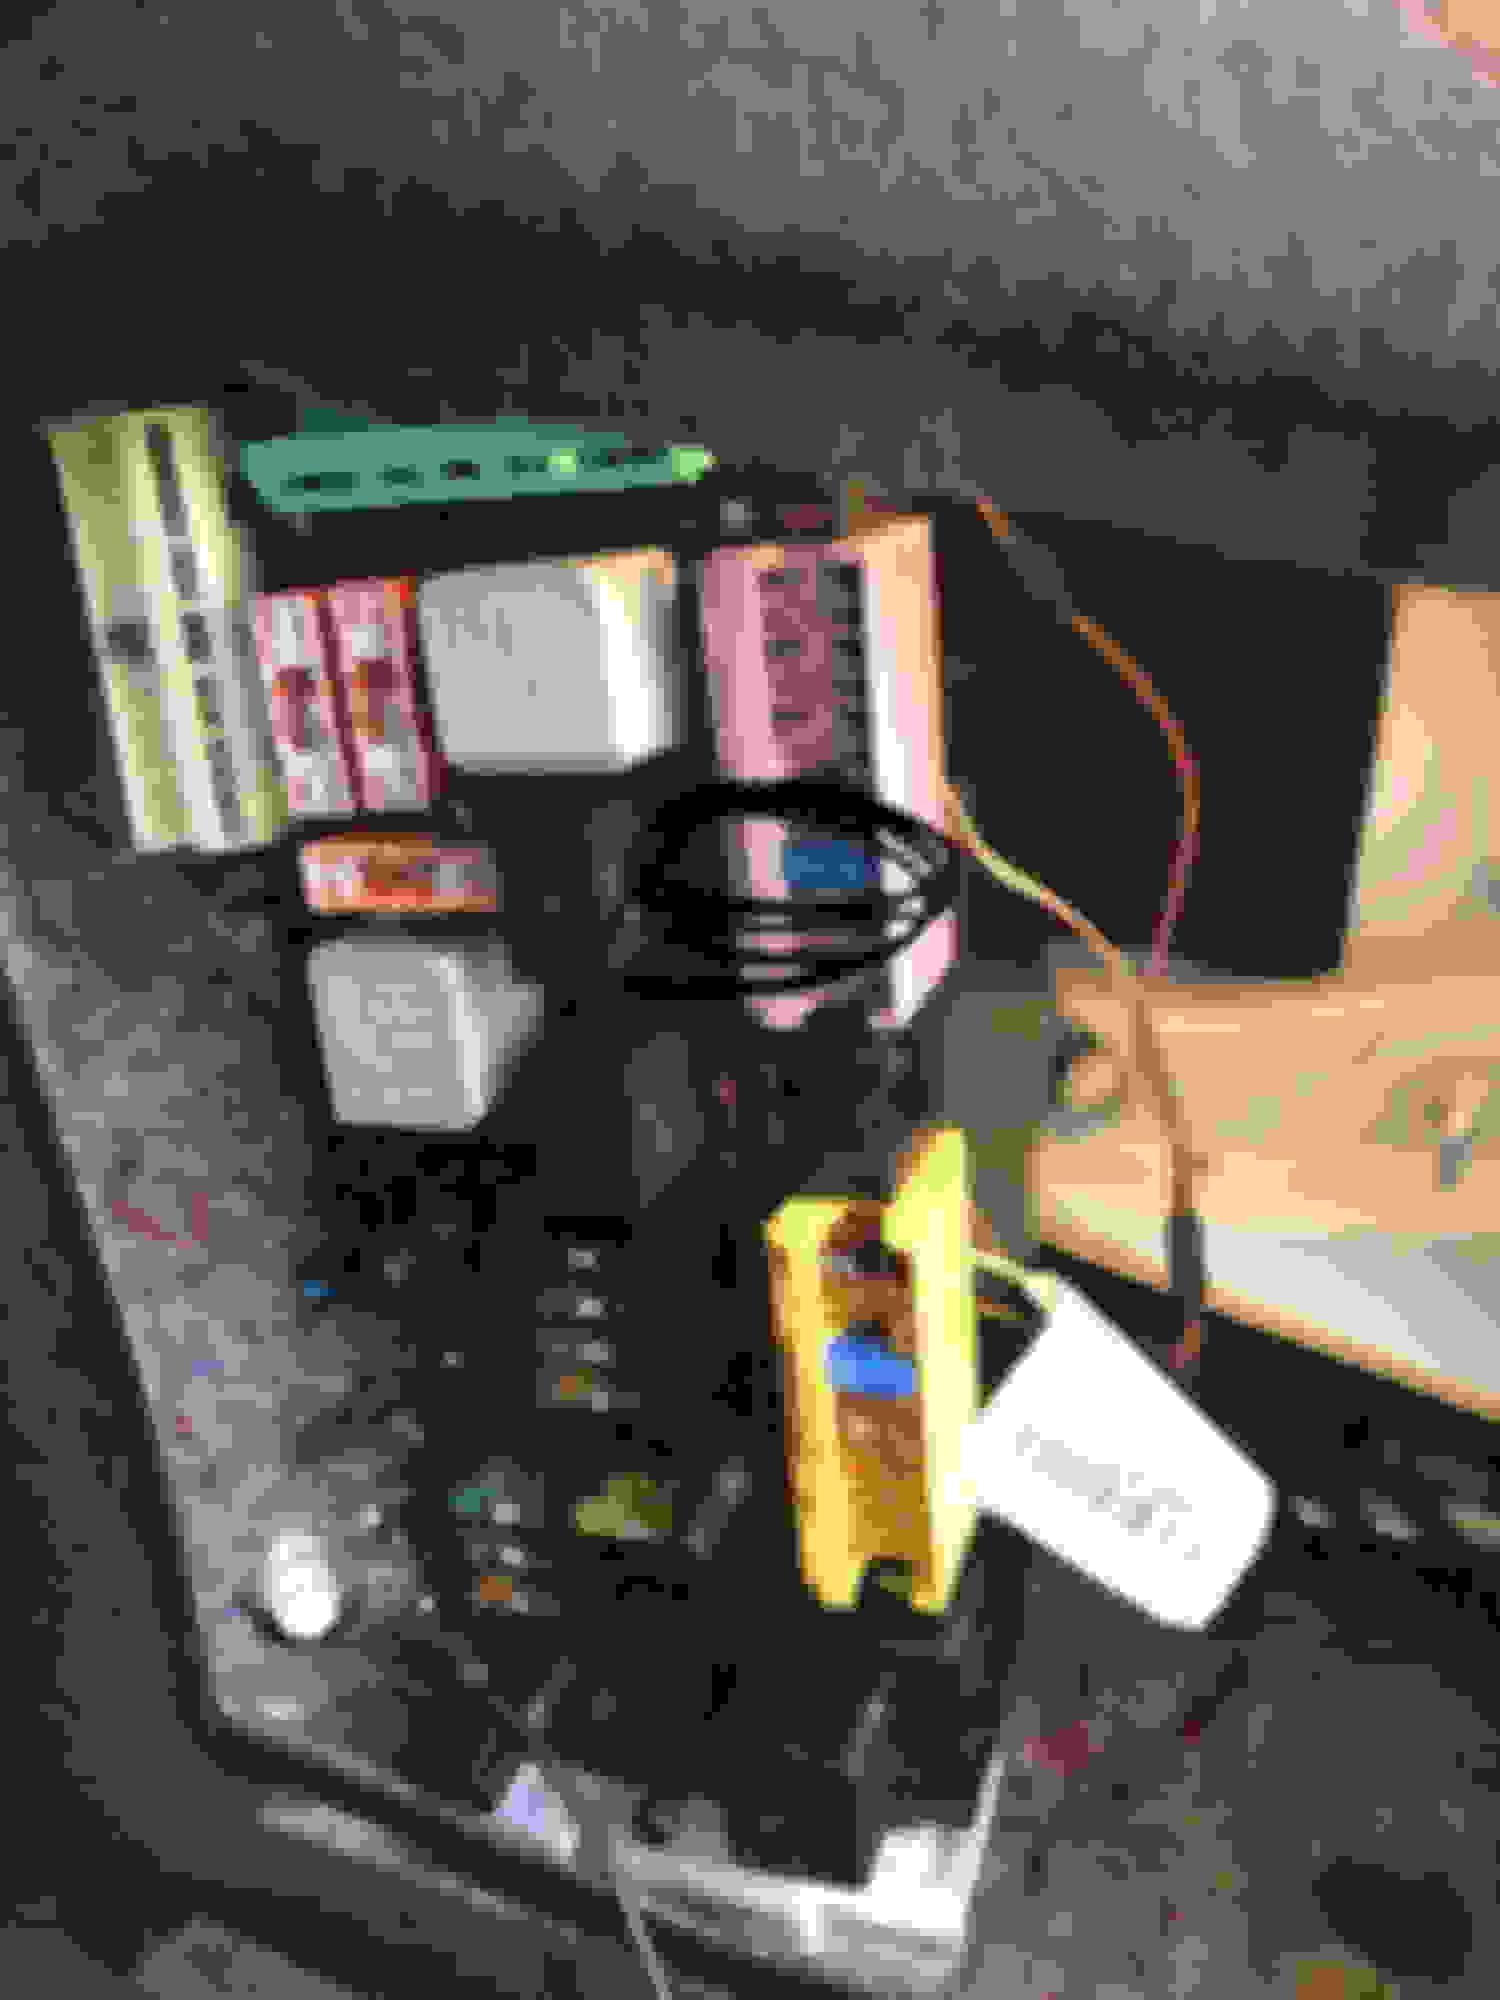 Water got in the fuse box, car is pretty bad - MBWorld.org ... on transformer box, layout for hexagonal box, power box, clip box, junction box, tube box, meter box, watch dogs box, cover box, the last of us box, relay box, ground box, case box, switch box, dark box, style box, four box, circuit box, breaker box, generator box,